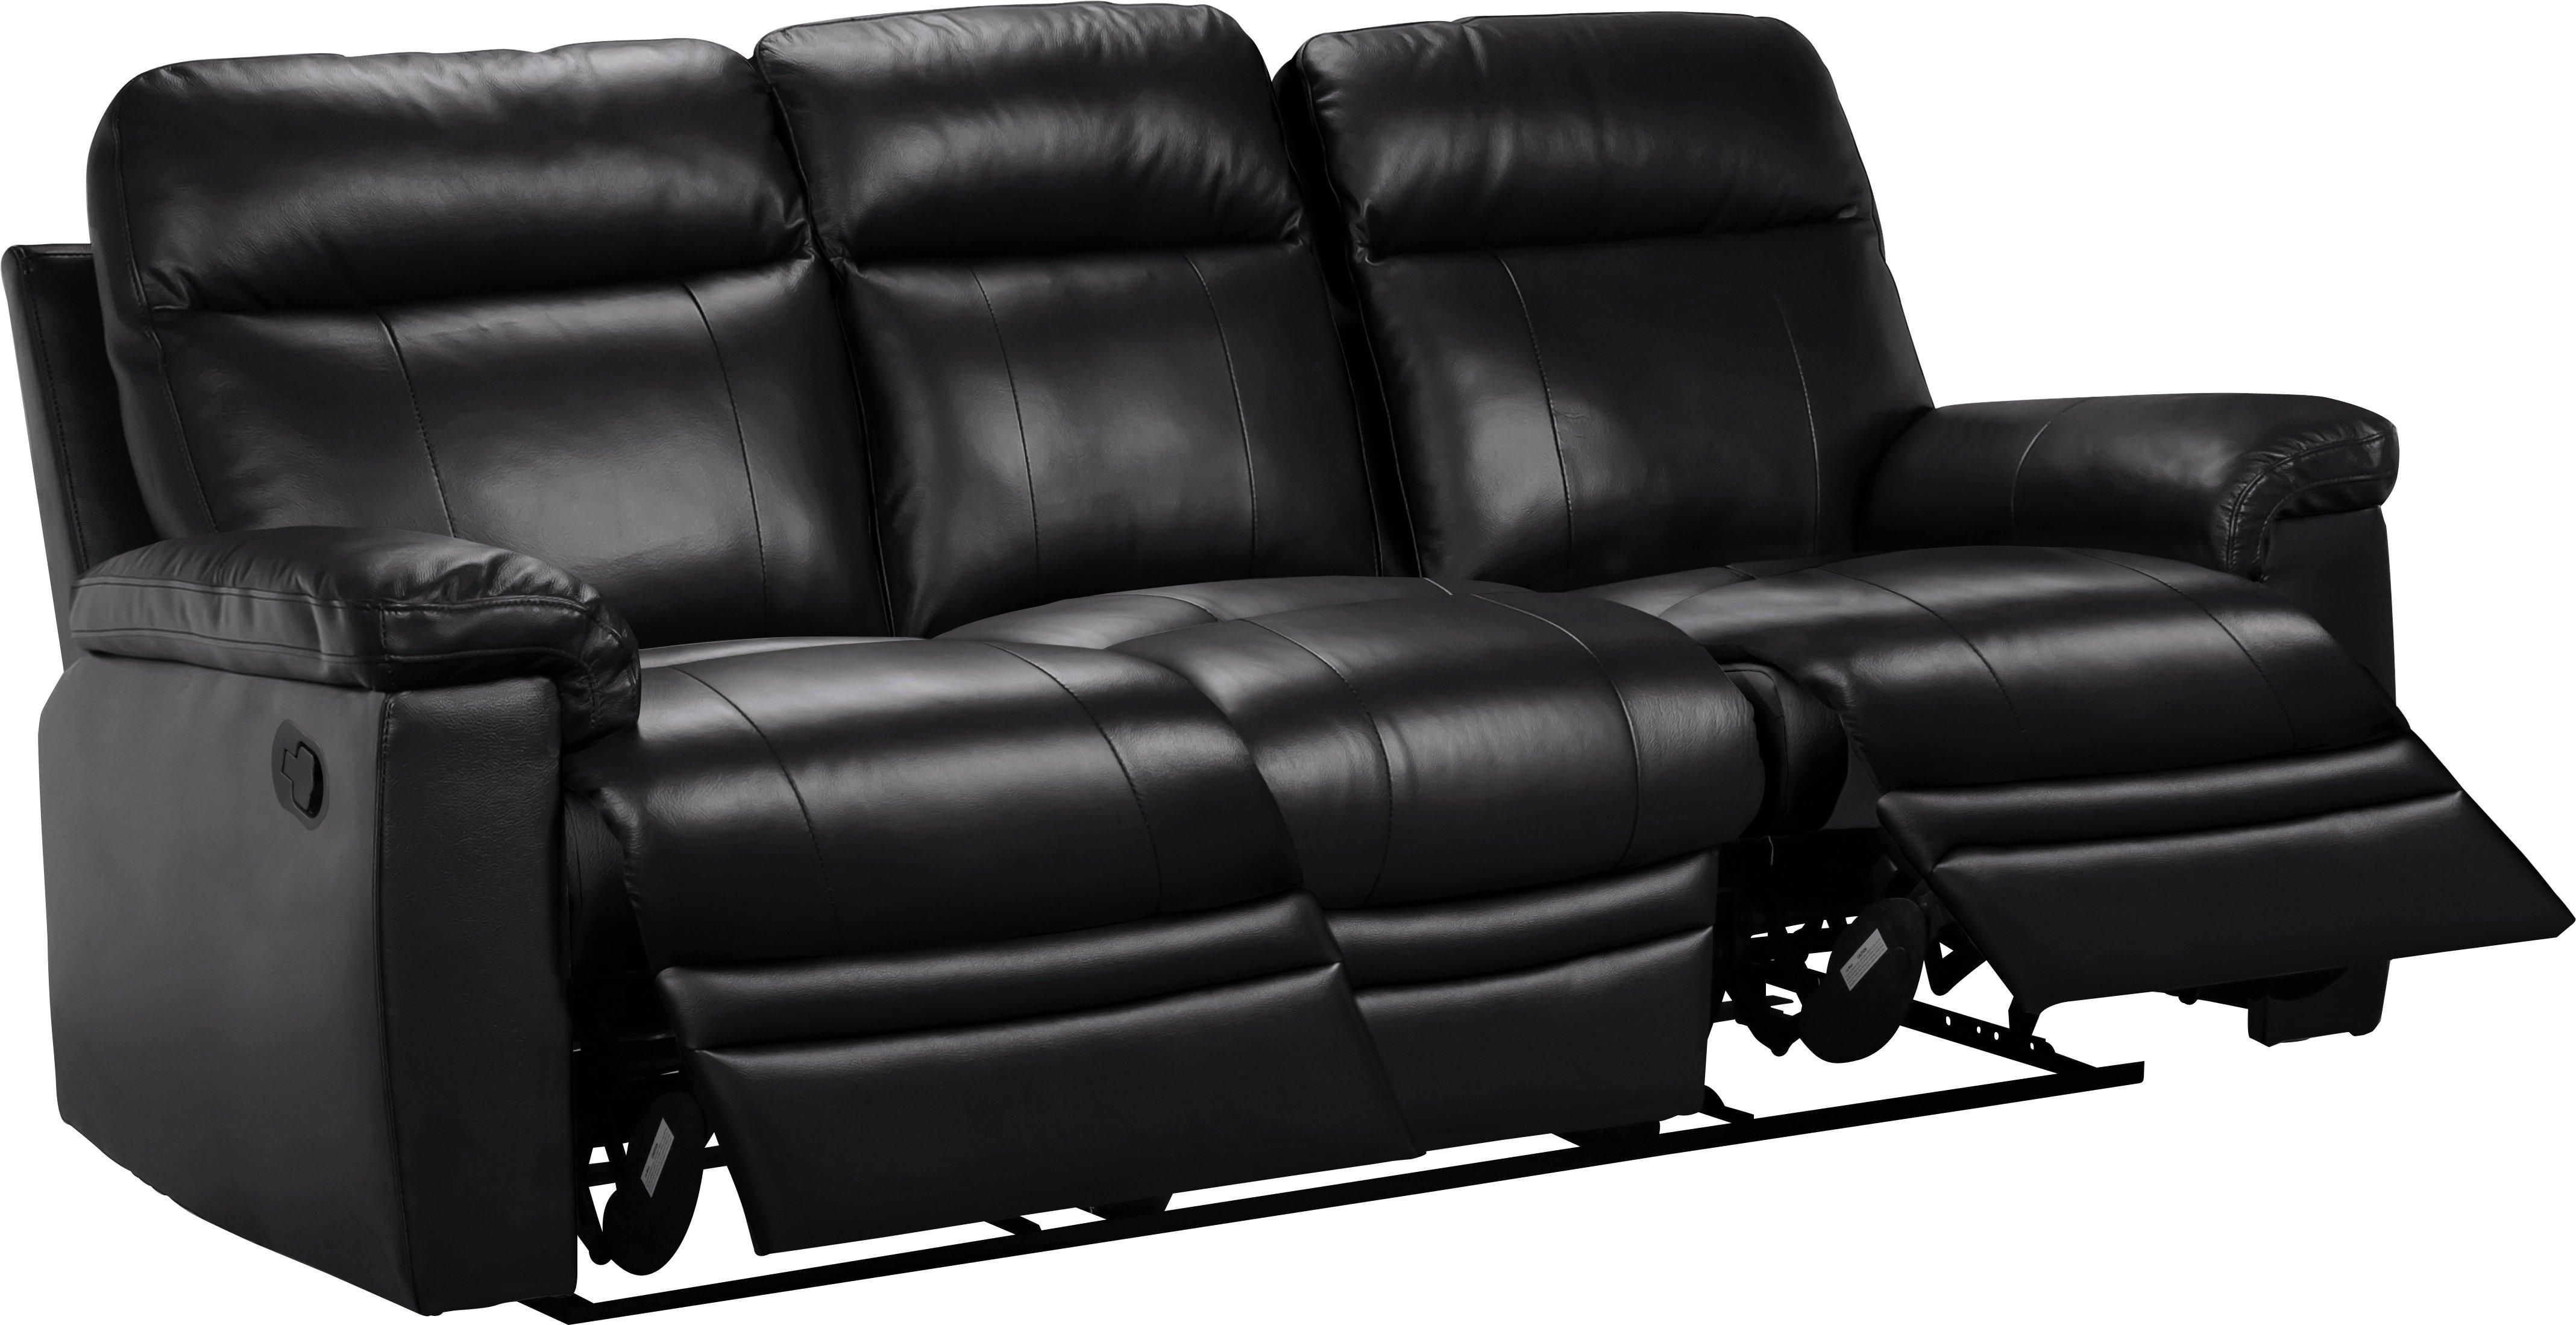 Merveilleux Argos Home New Paolo 3 Seater Manual Recliner Sofa   Black